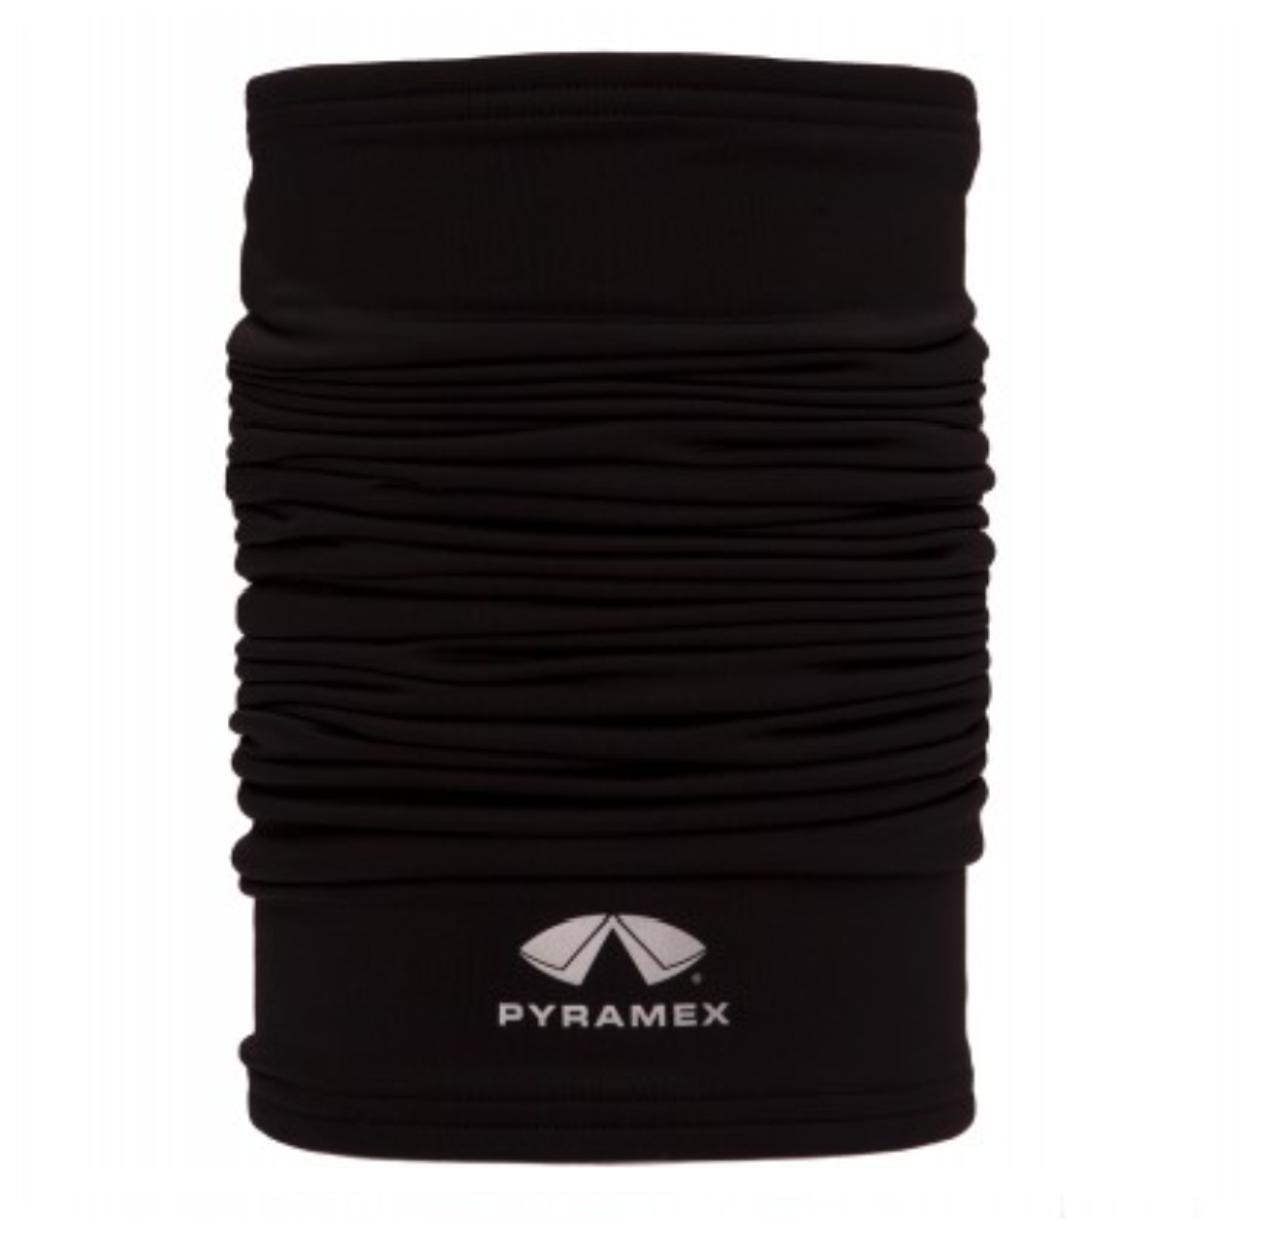 Pyramex MPBFL60 Fleece Multi-Purpose Mask, Black (Qty. 1)